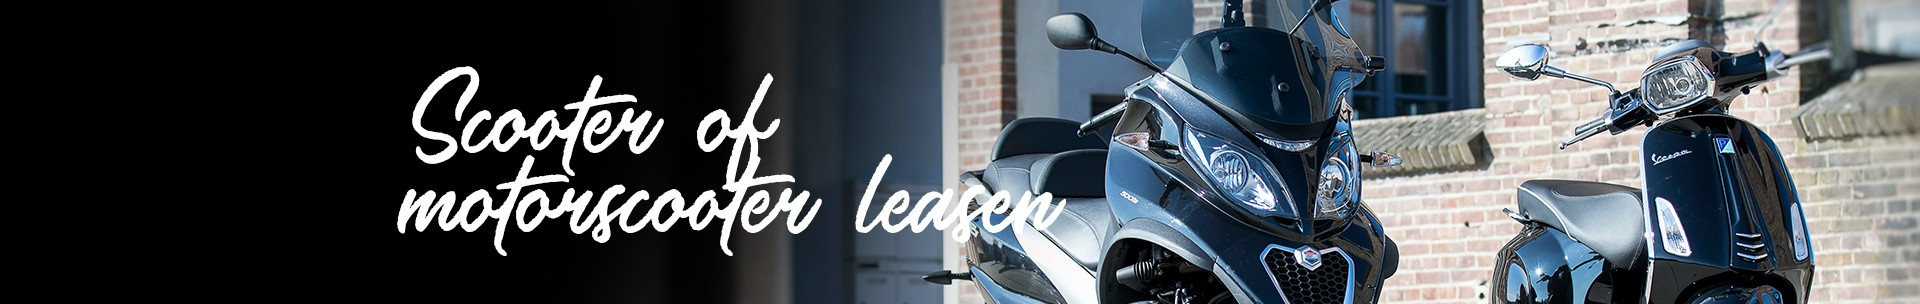 Scooter of motorscooter leasen